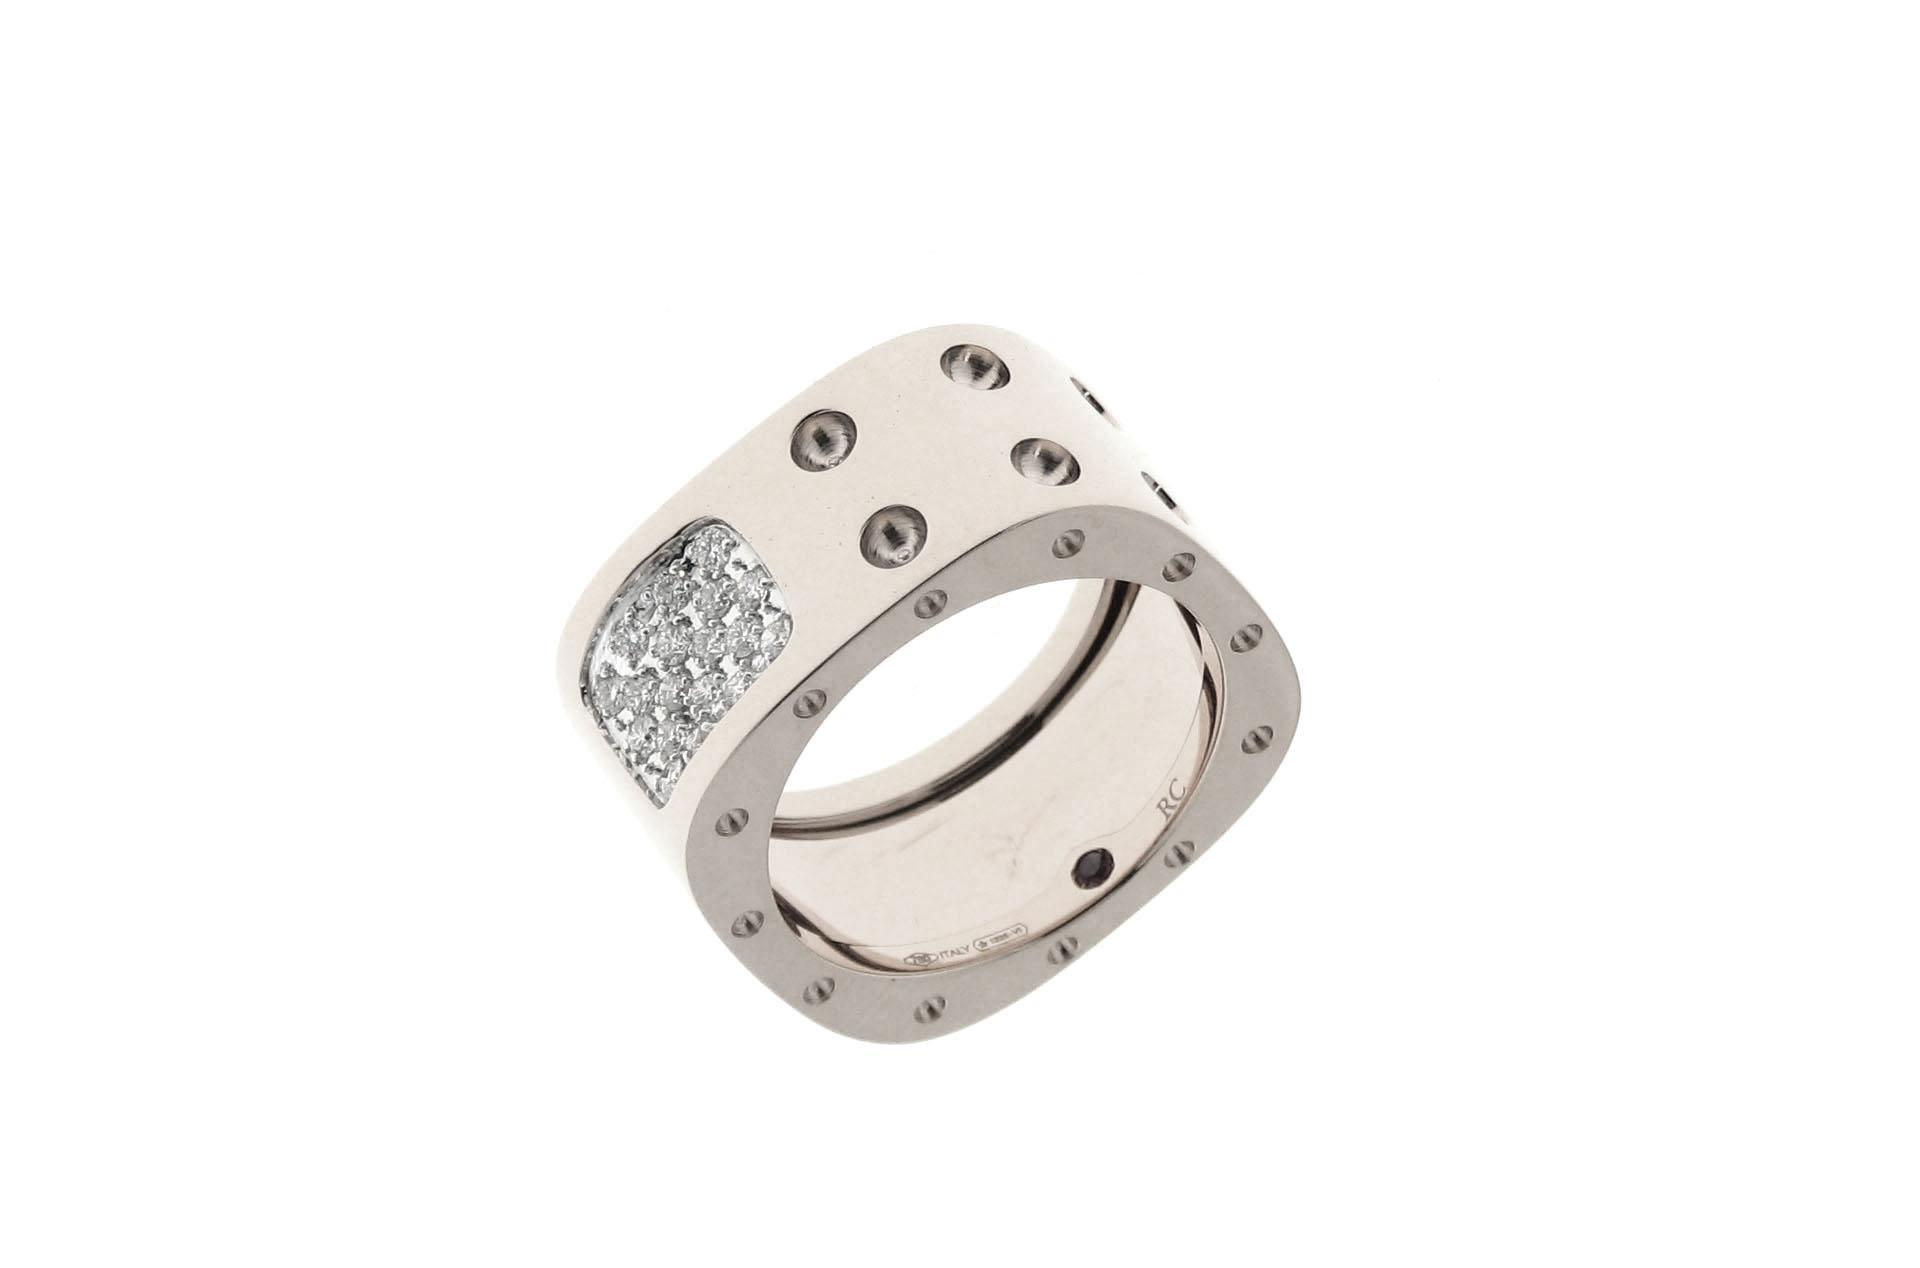 Бренд Roberto Coin коллекция Pois Moi кольцо ADR888RI0972